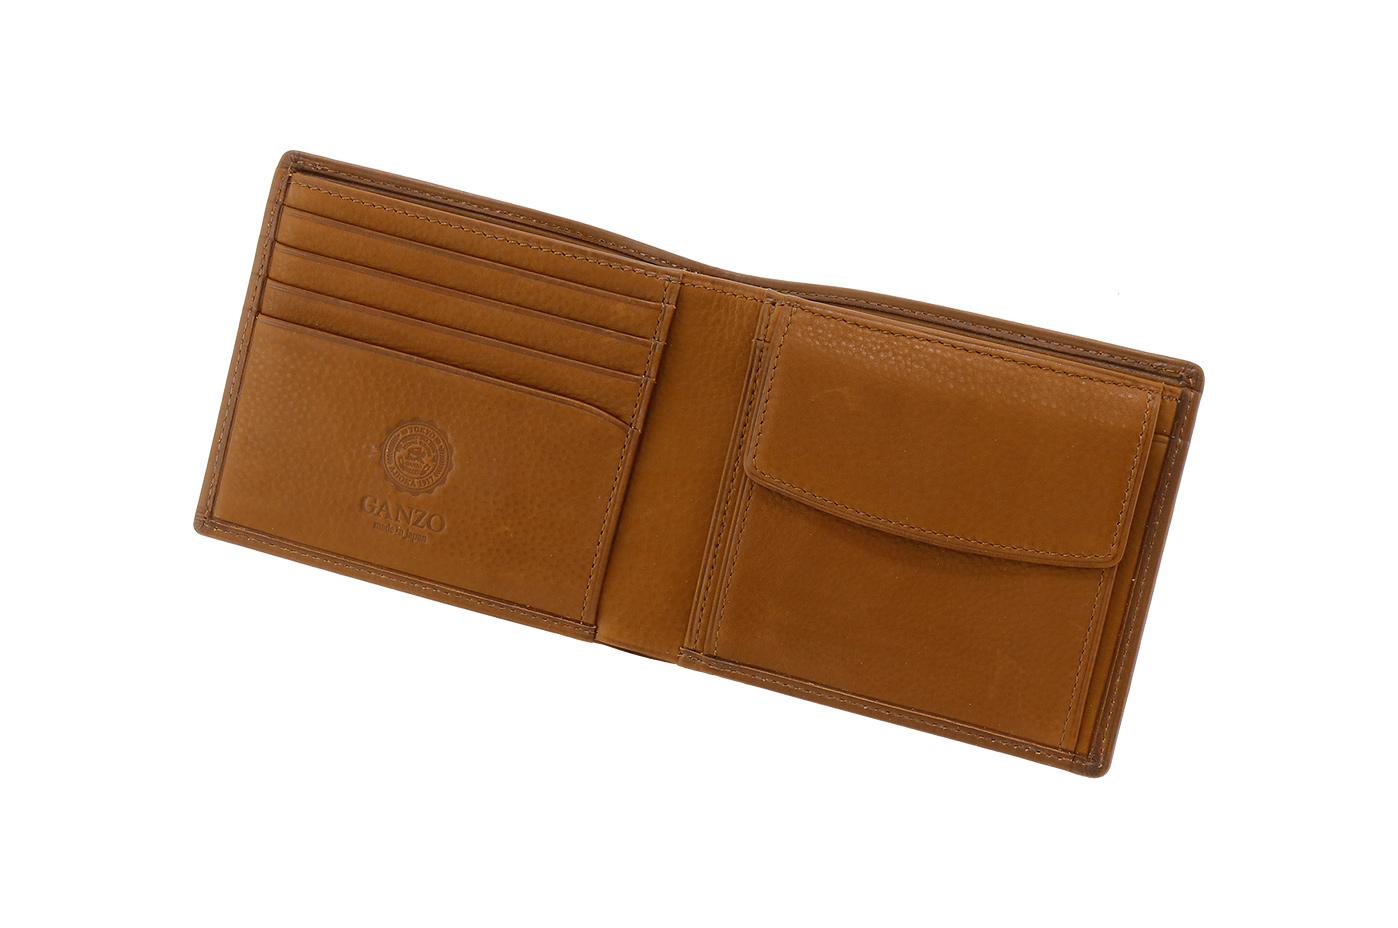 GANZO BABY CALF小銭入れ付き二つ折り財布